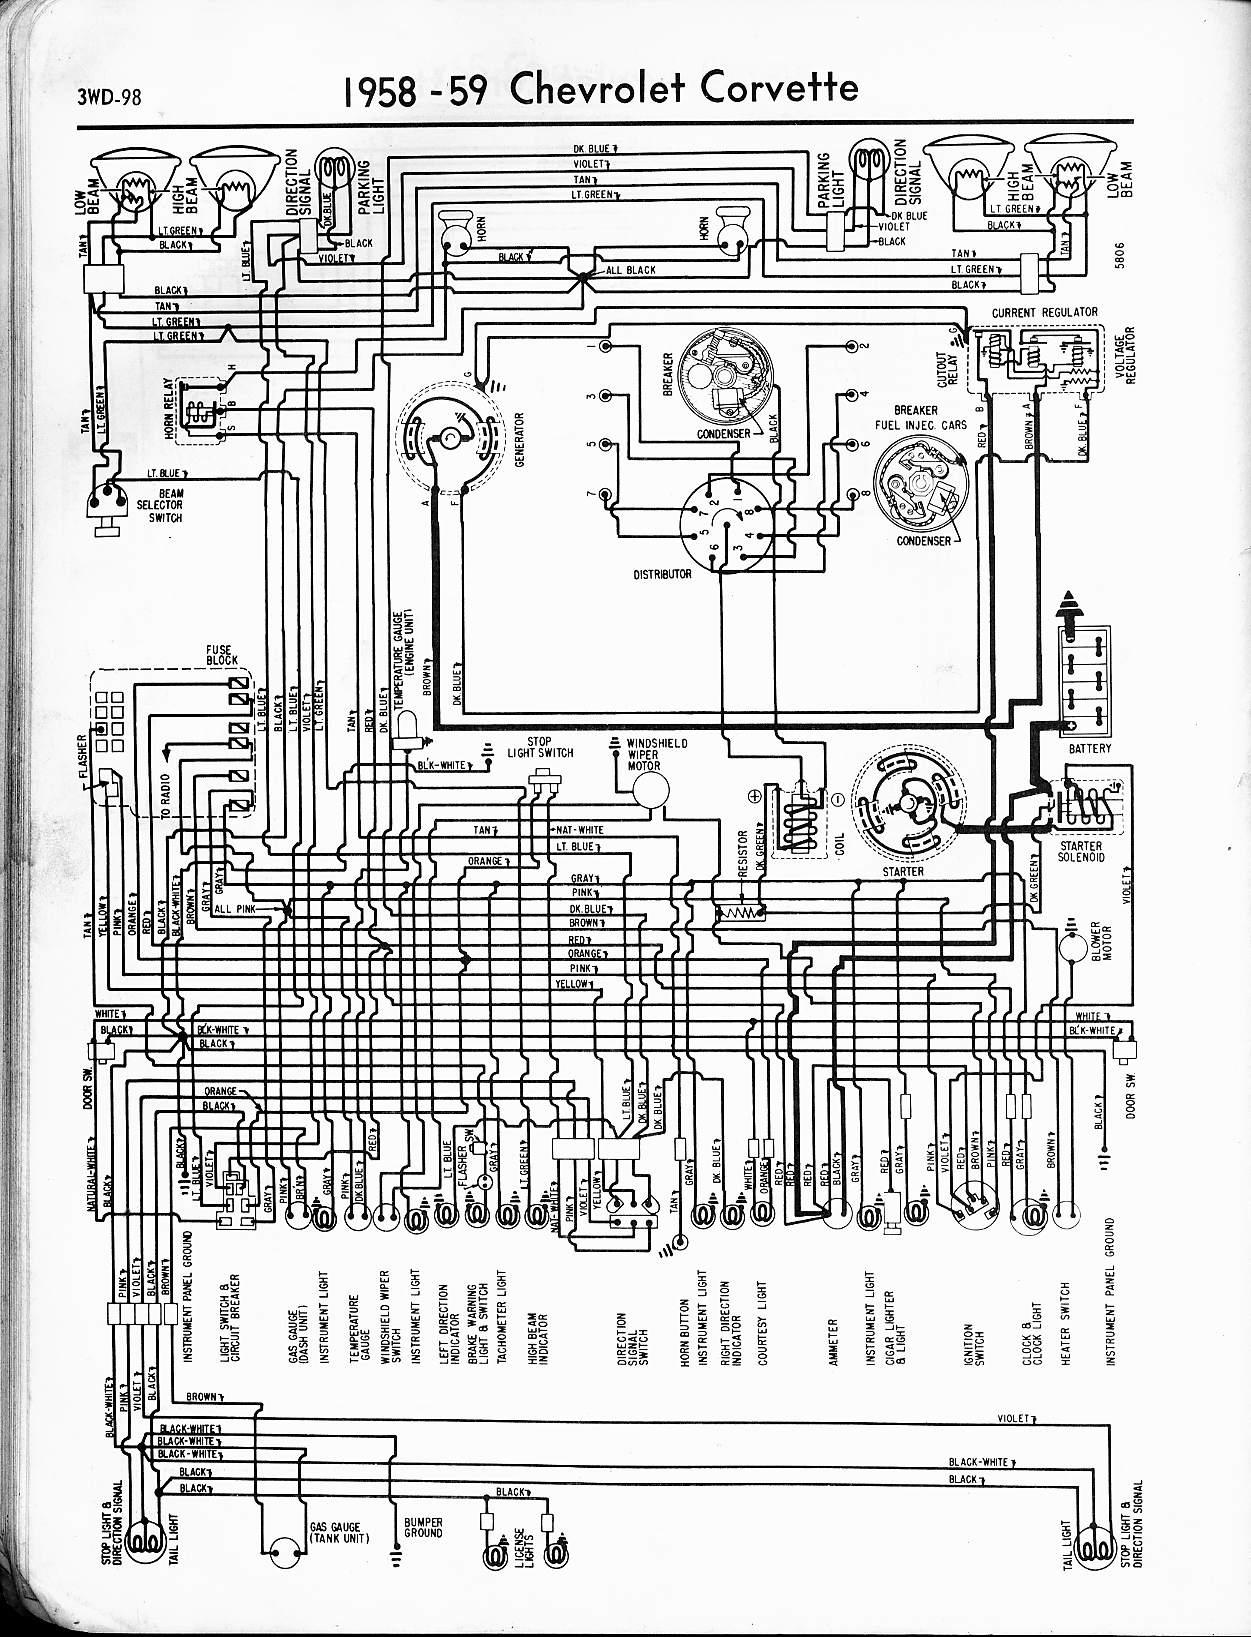 1958 pontiac chieftain wiring diagram dr 3689  1965 chevelle wiring diagram  dr 3689  1965 chevelle wiring diagram